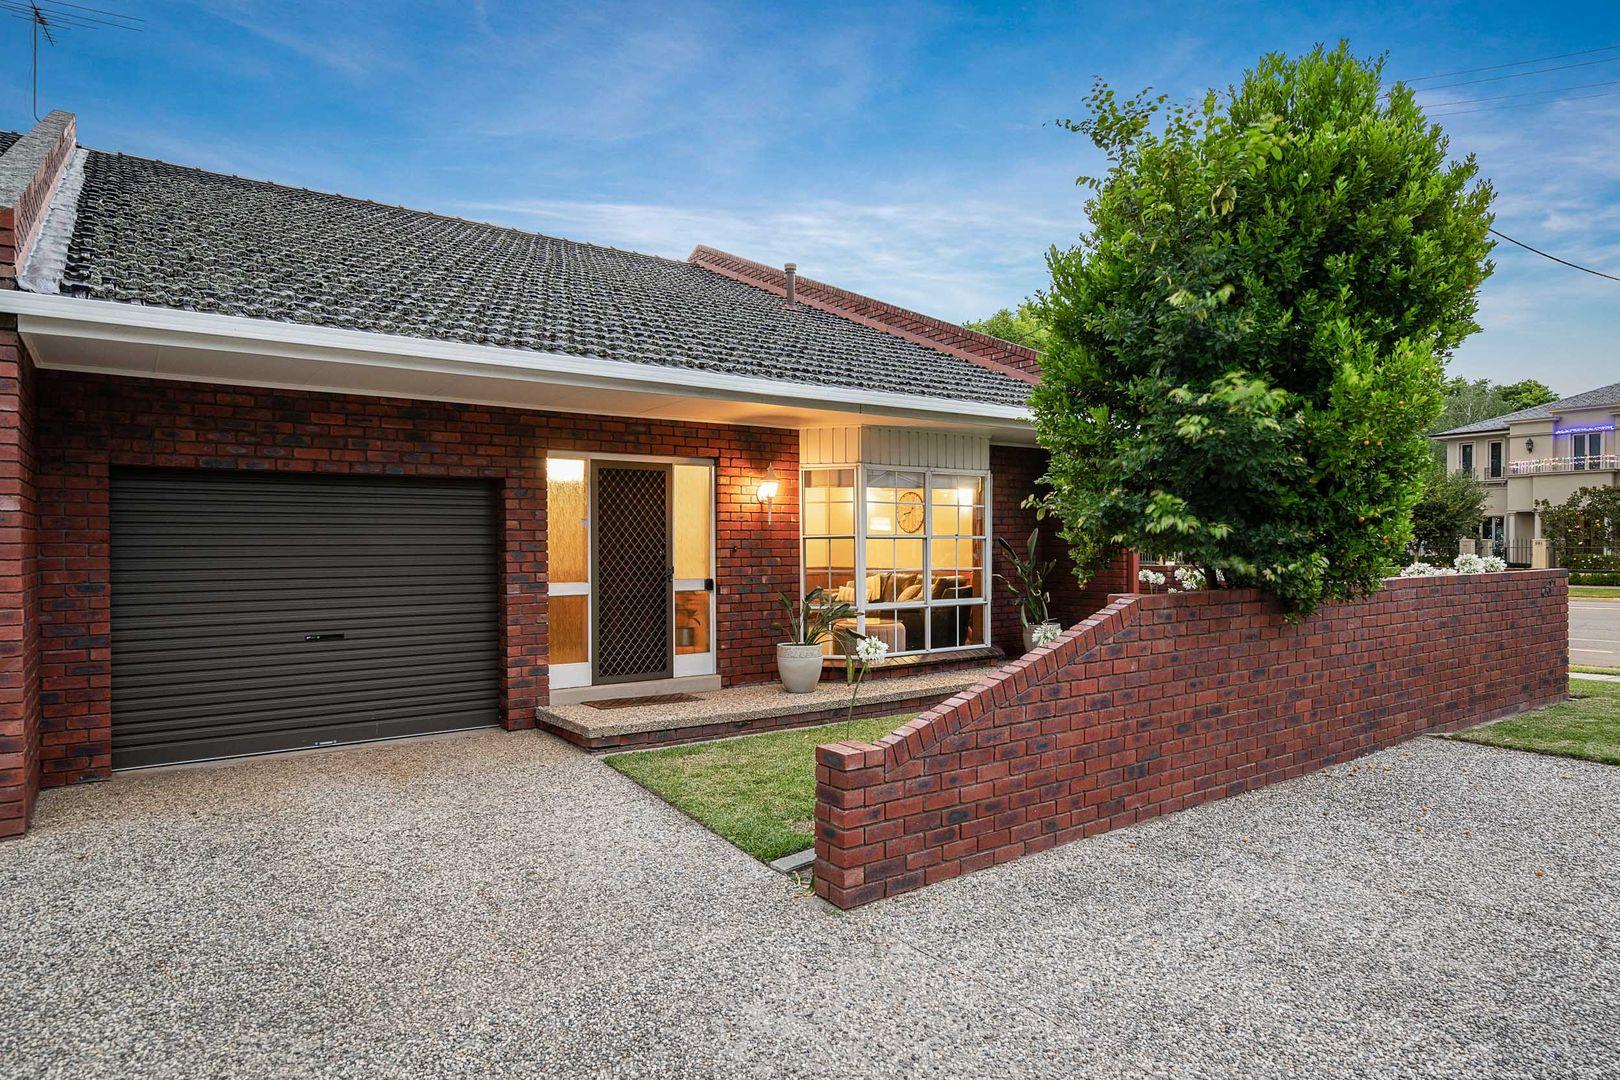 2/537 Kiewa Place, Albury NSW 2640, Image 0